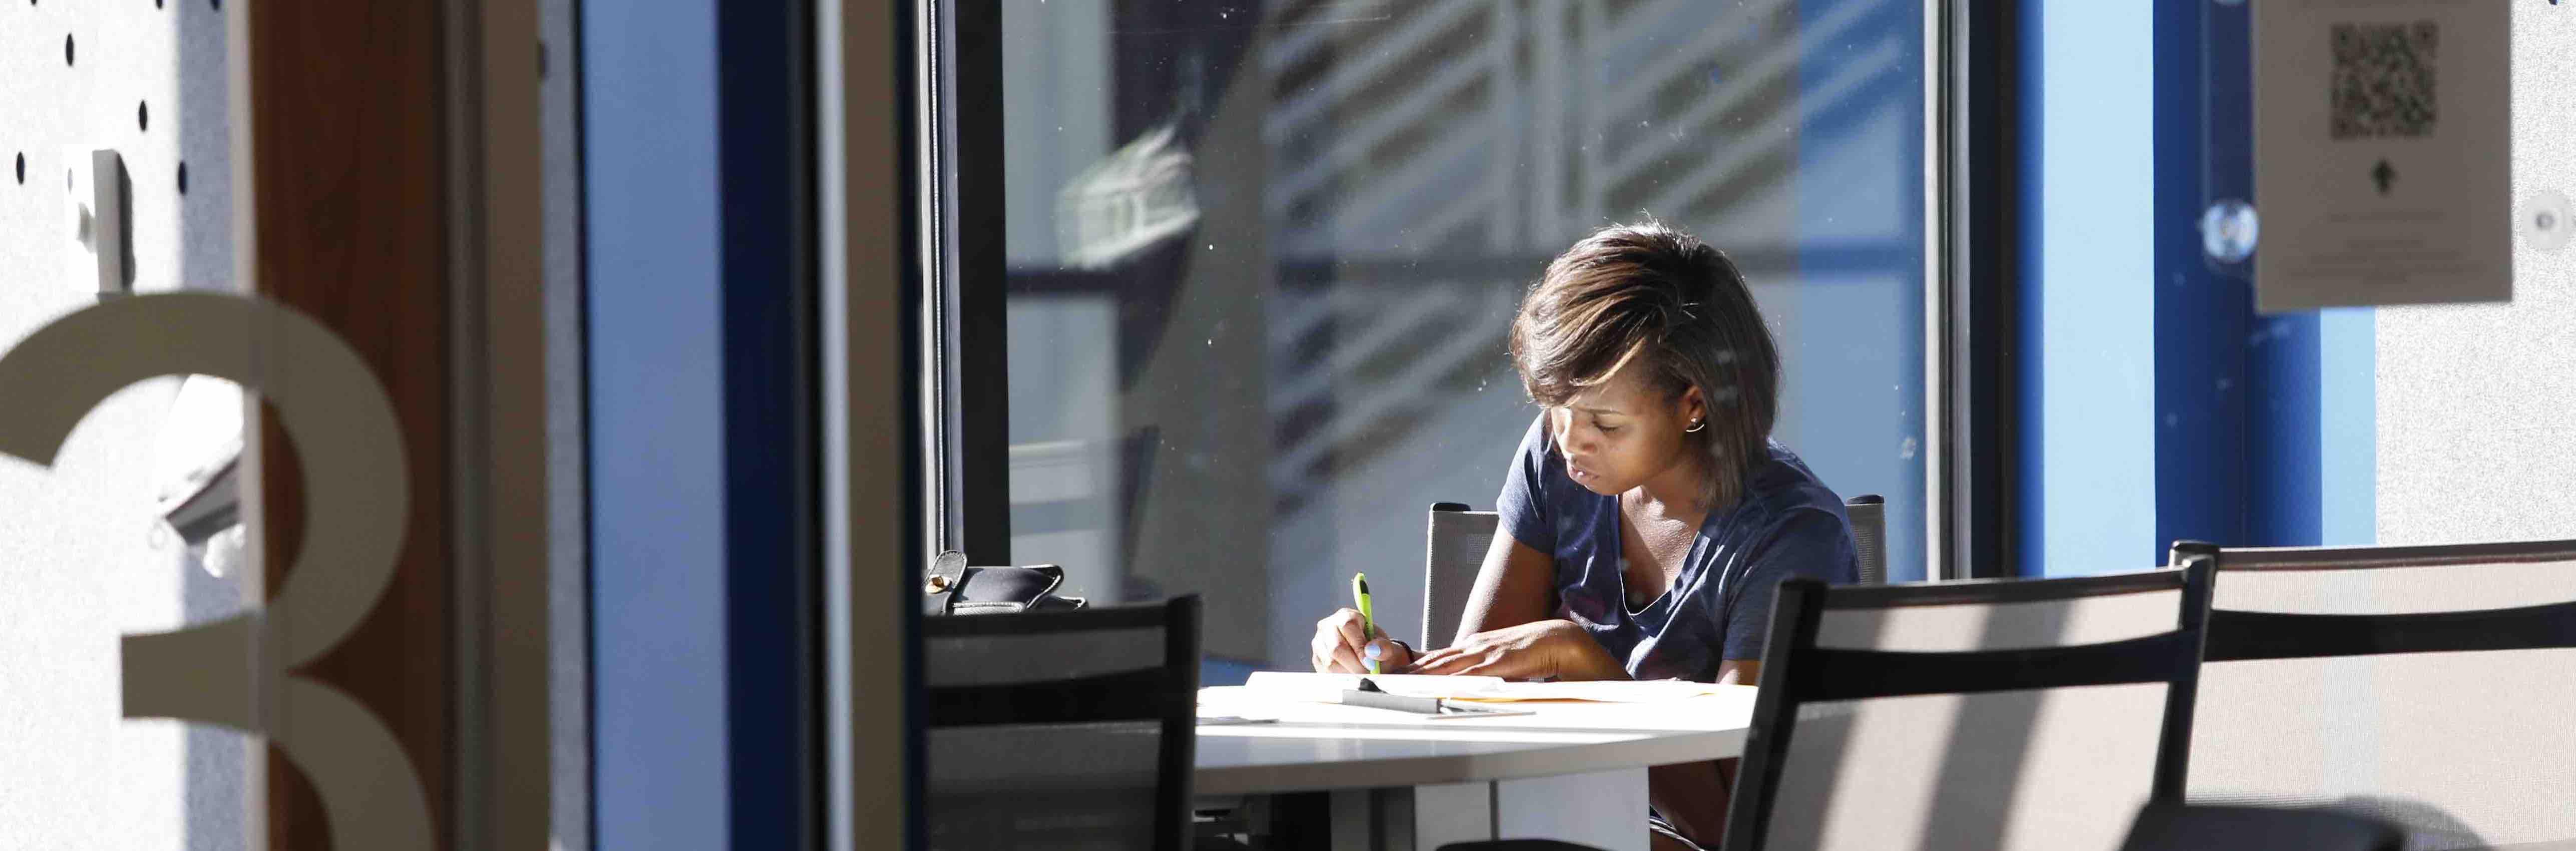 student-studying-near-window2-b.jpg